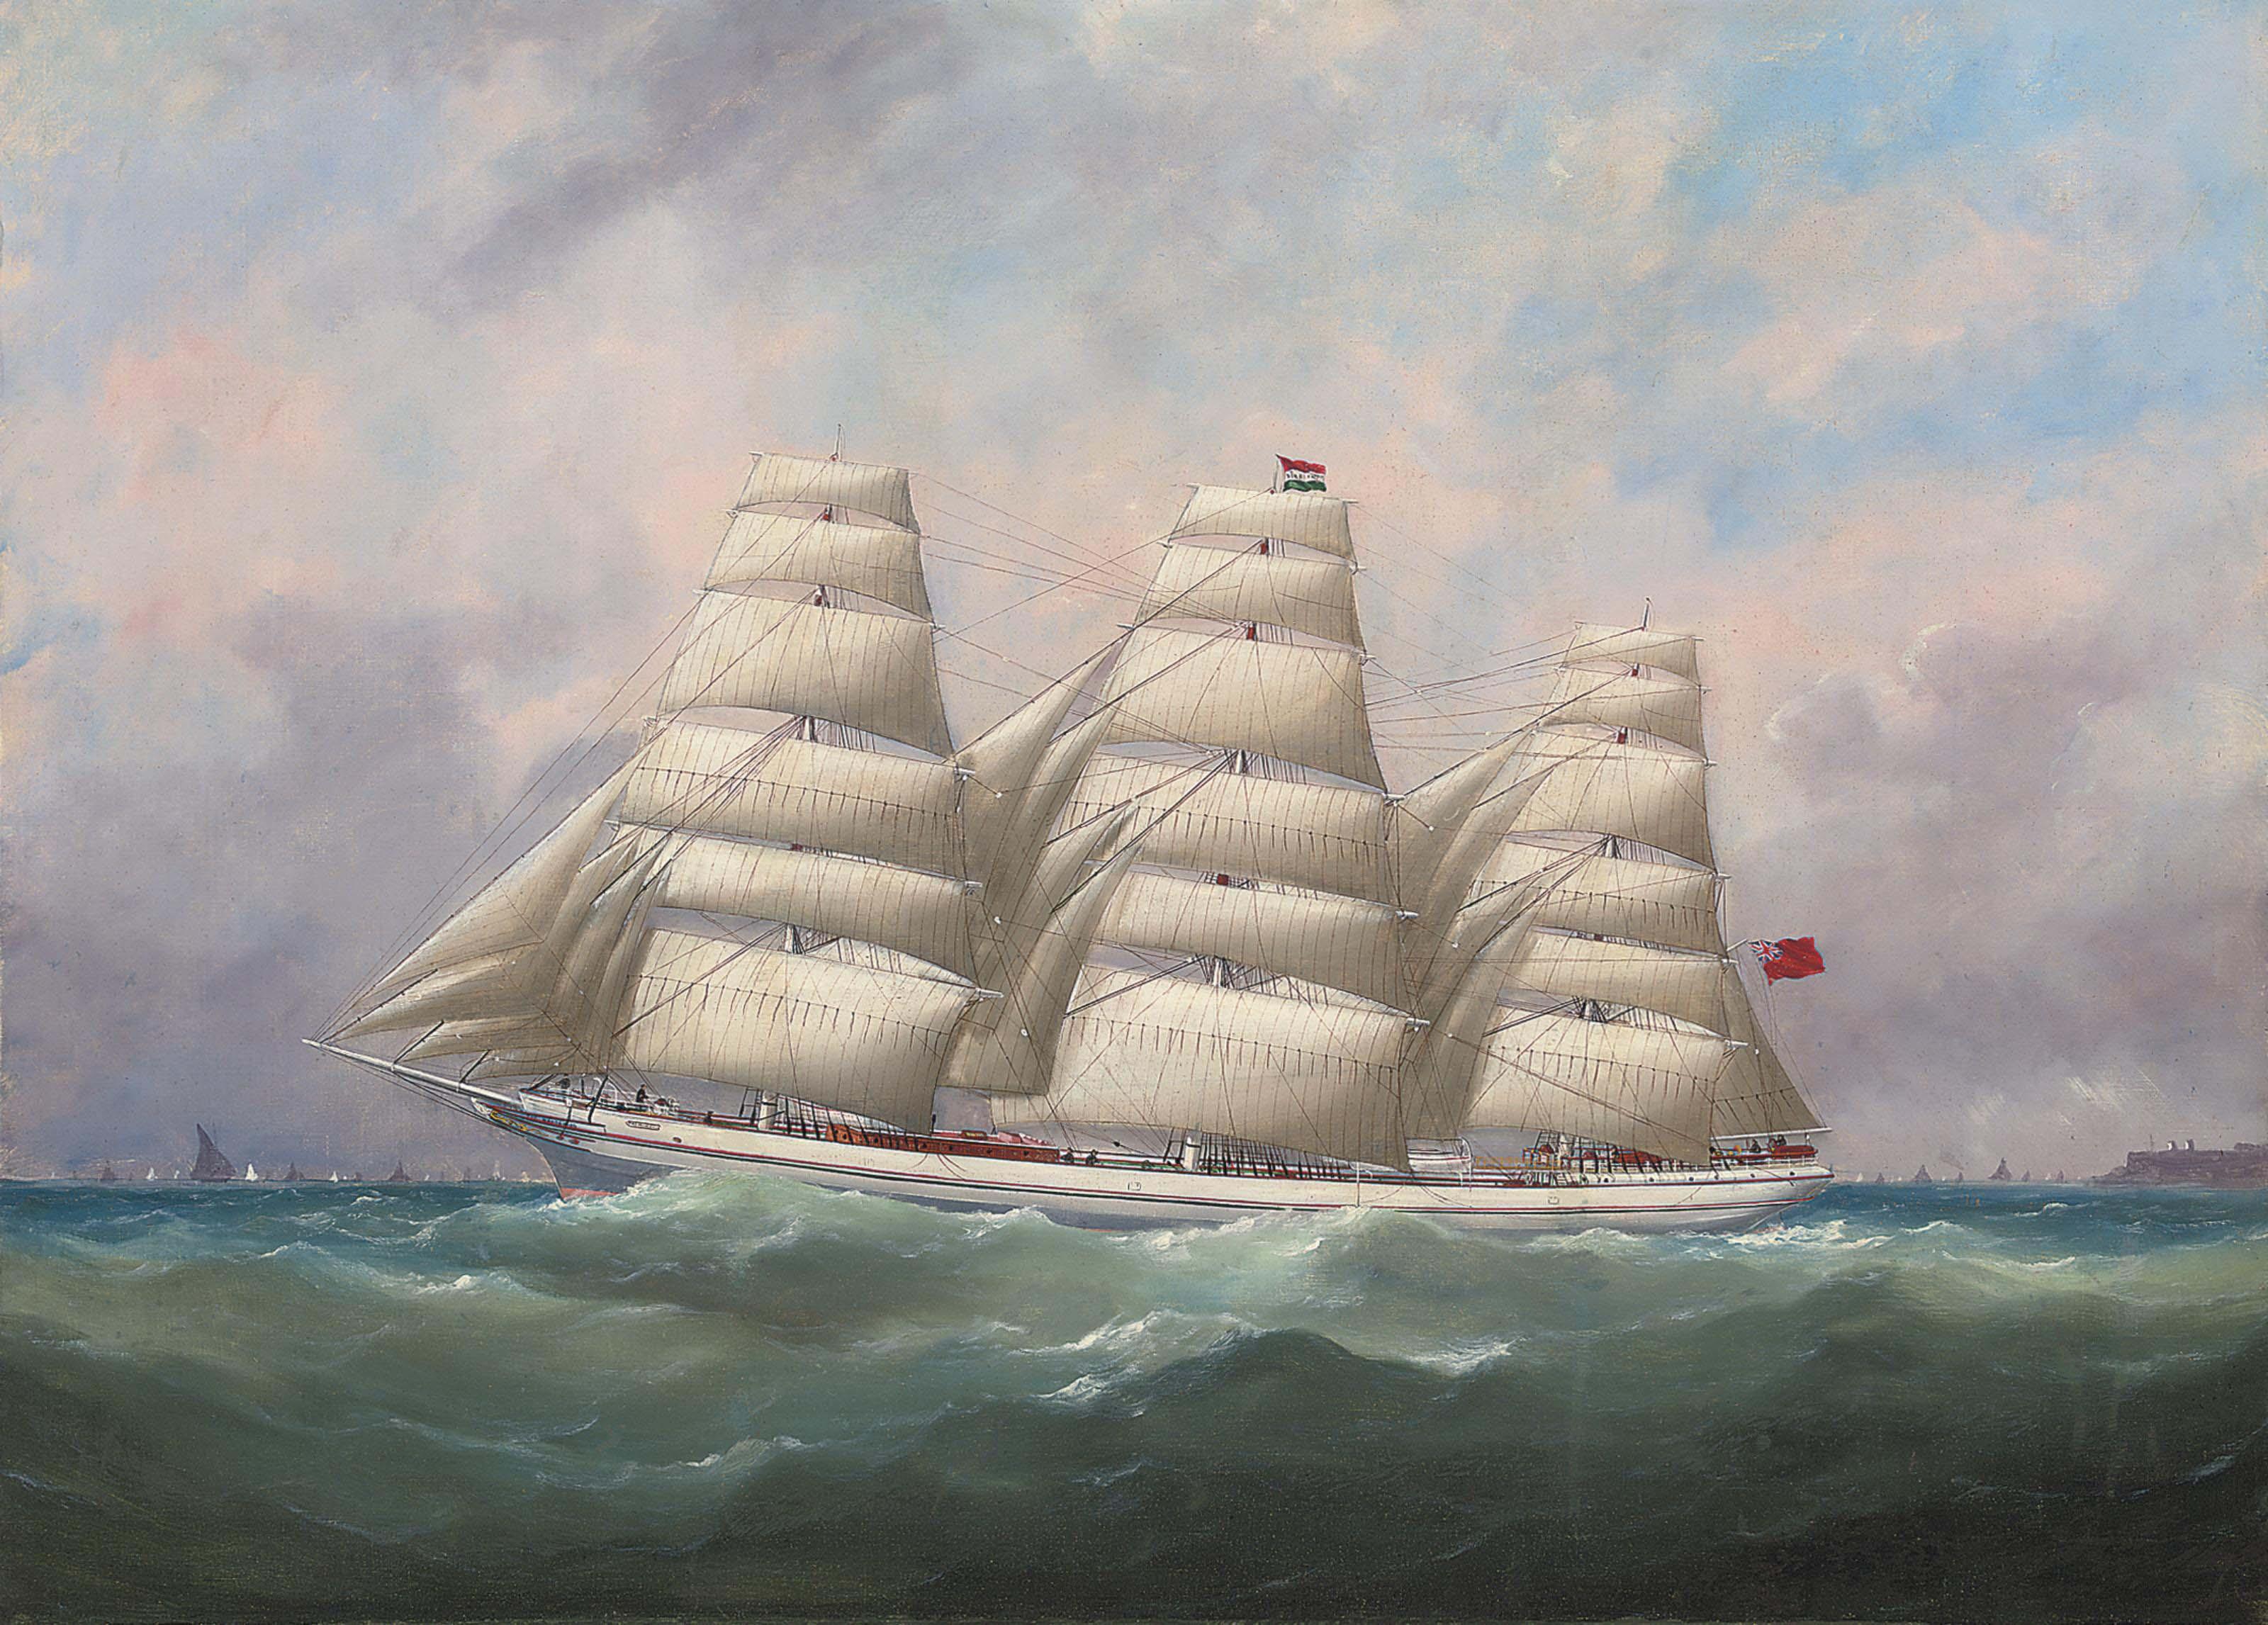 The three-master Hahnemann in full sail off a headland